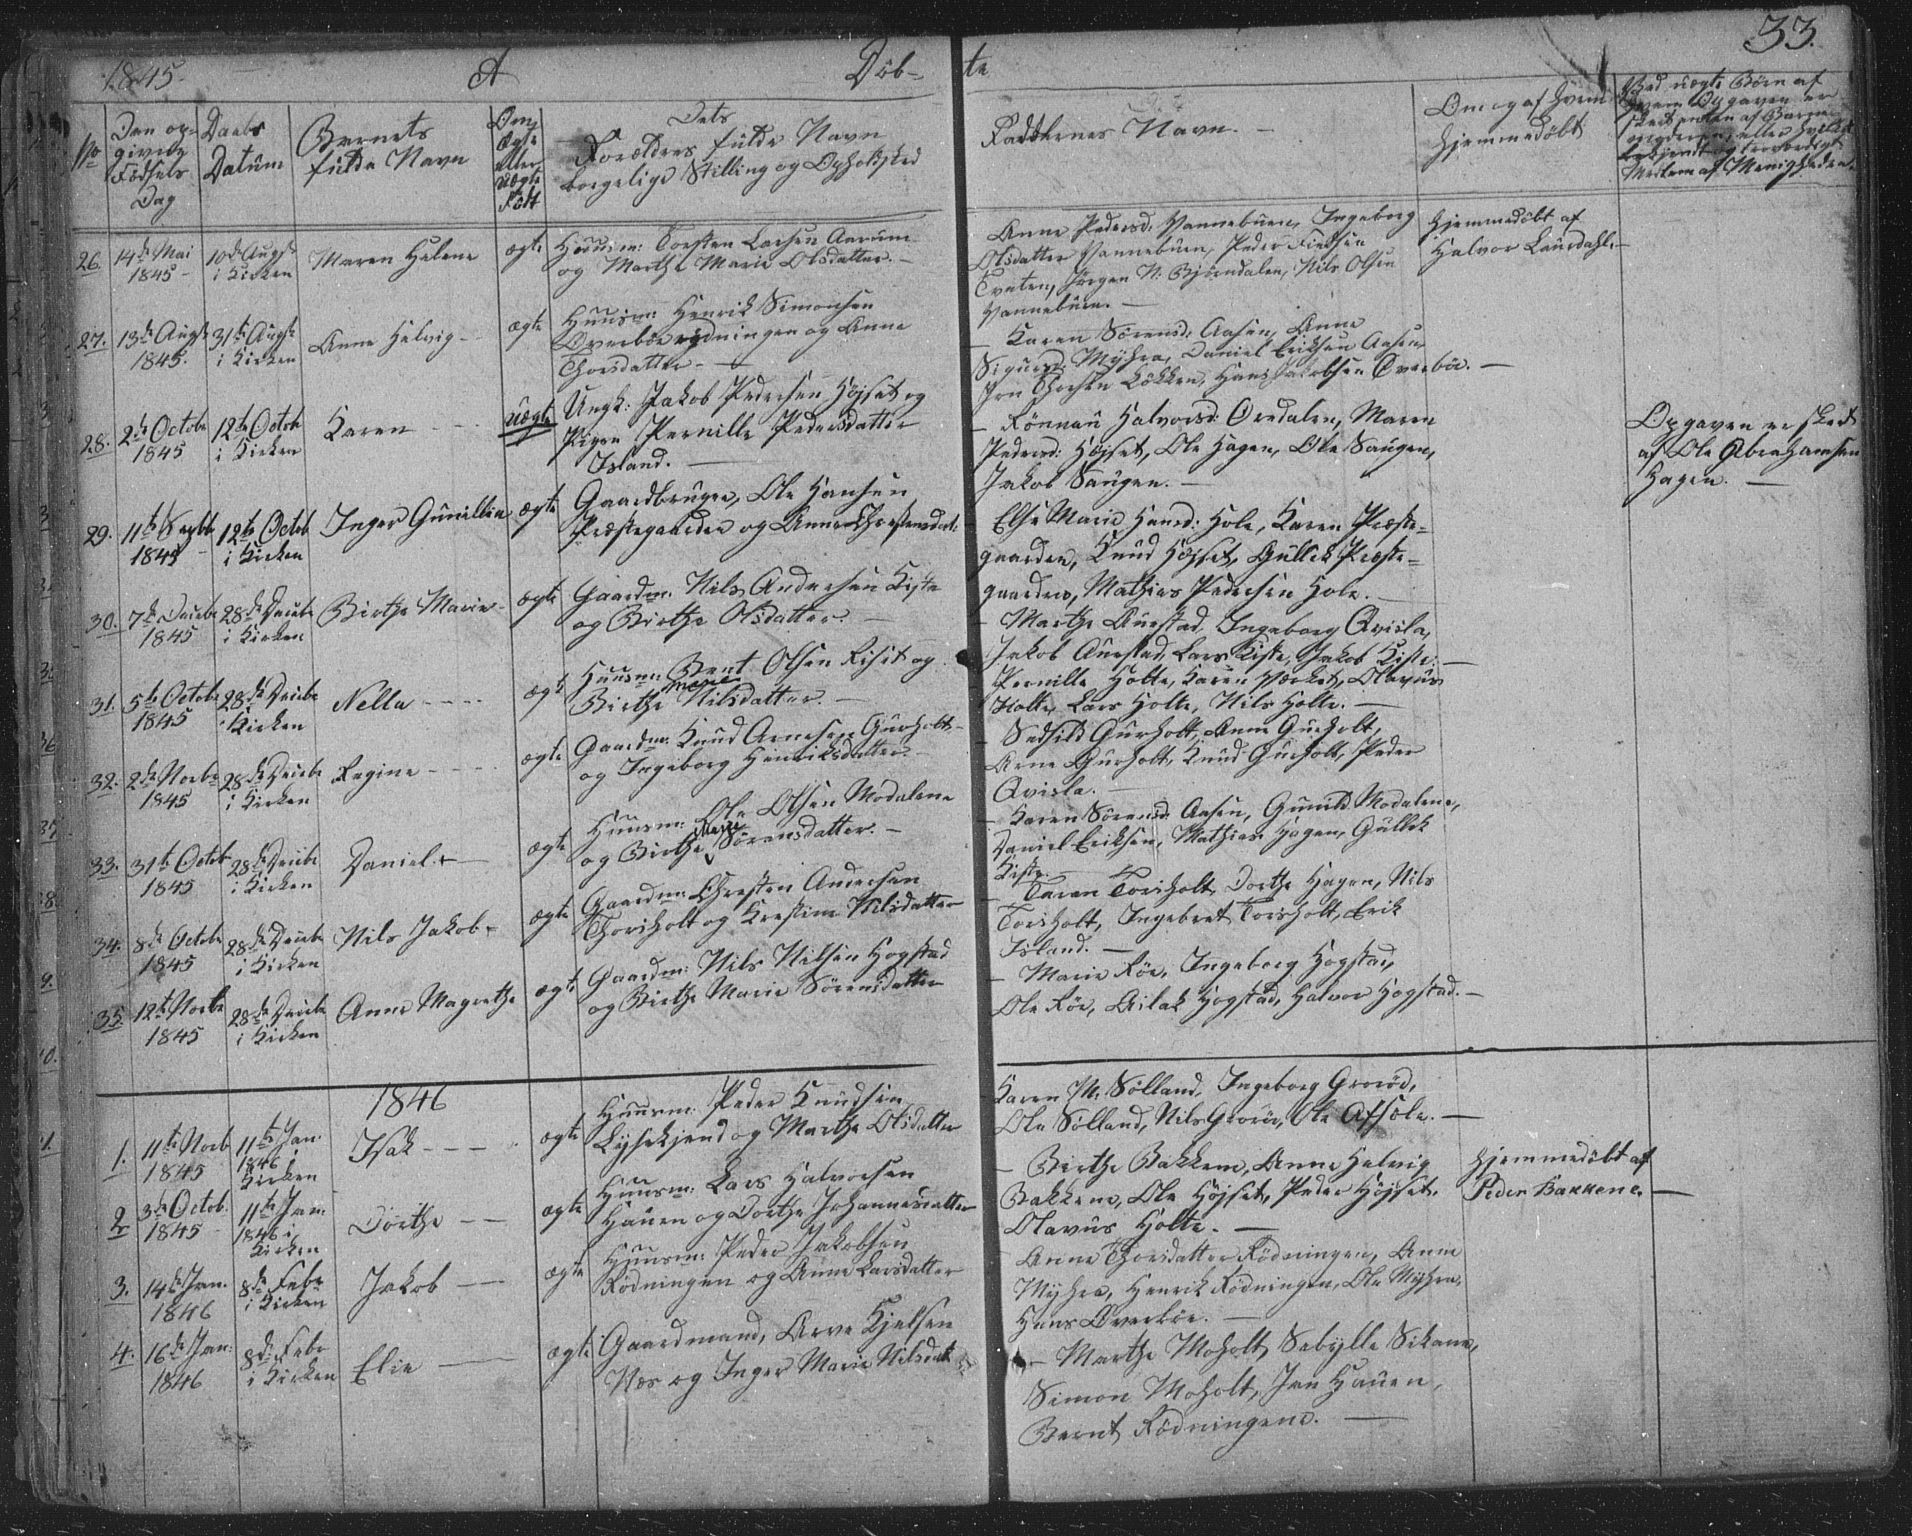 SAKO, Siljan kirkebøker, F/Fa/L0001: Parish register (official) no. 1, 1831-1870, p. 33